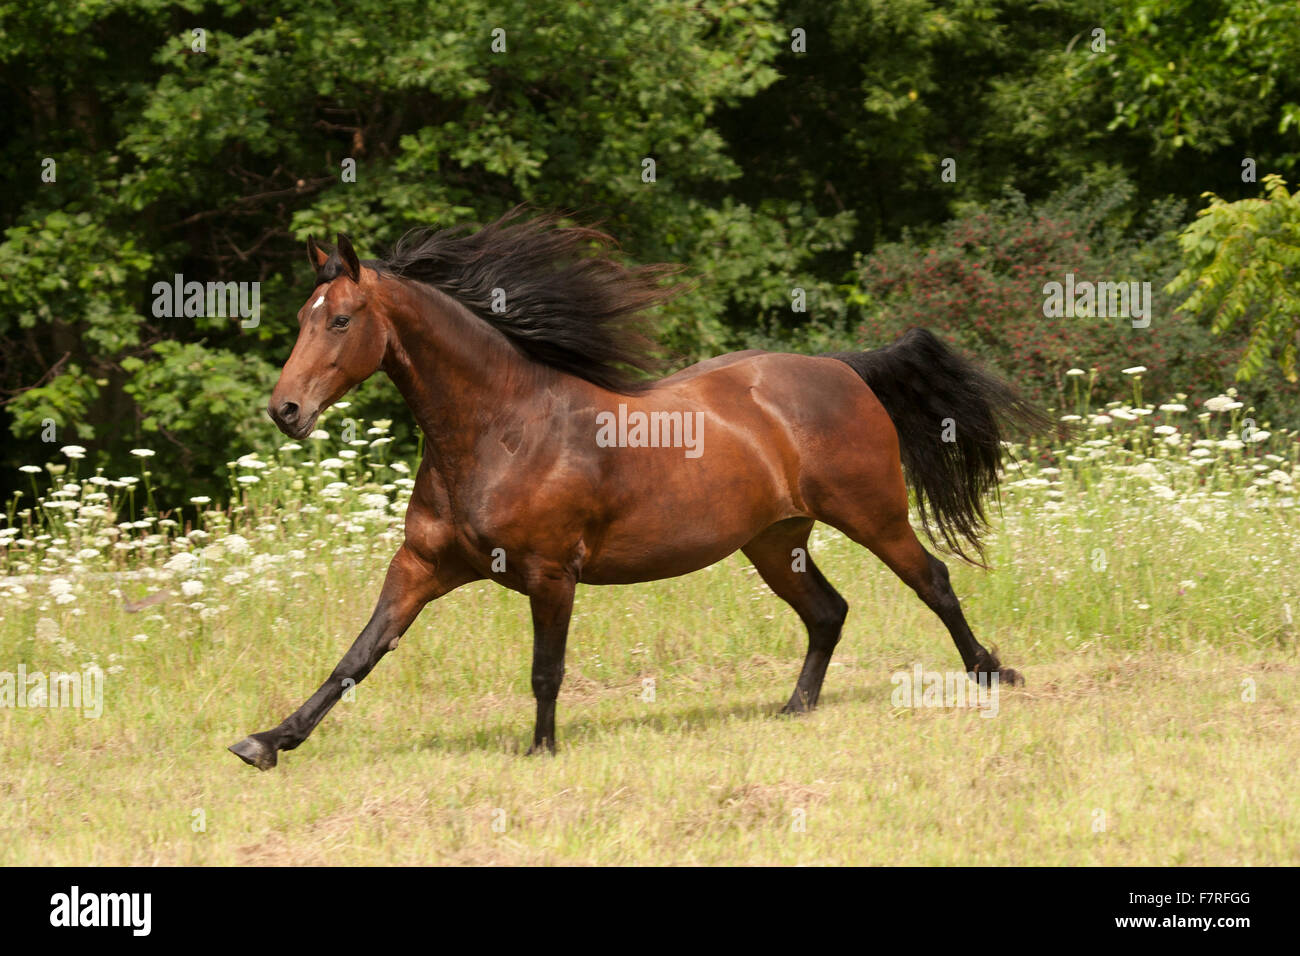 Bay horse gallops through field - Stock Image